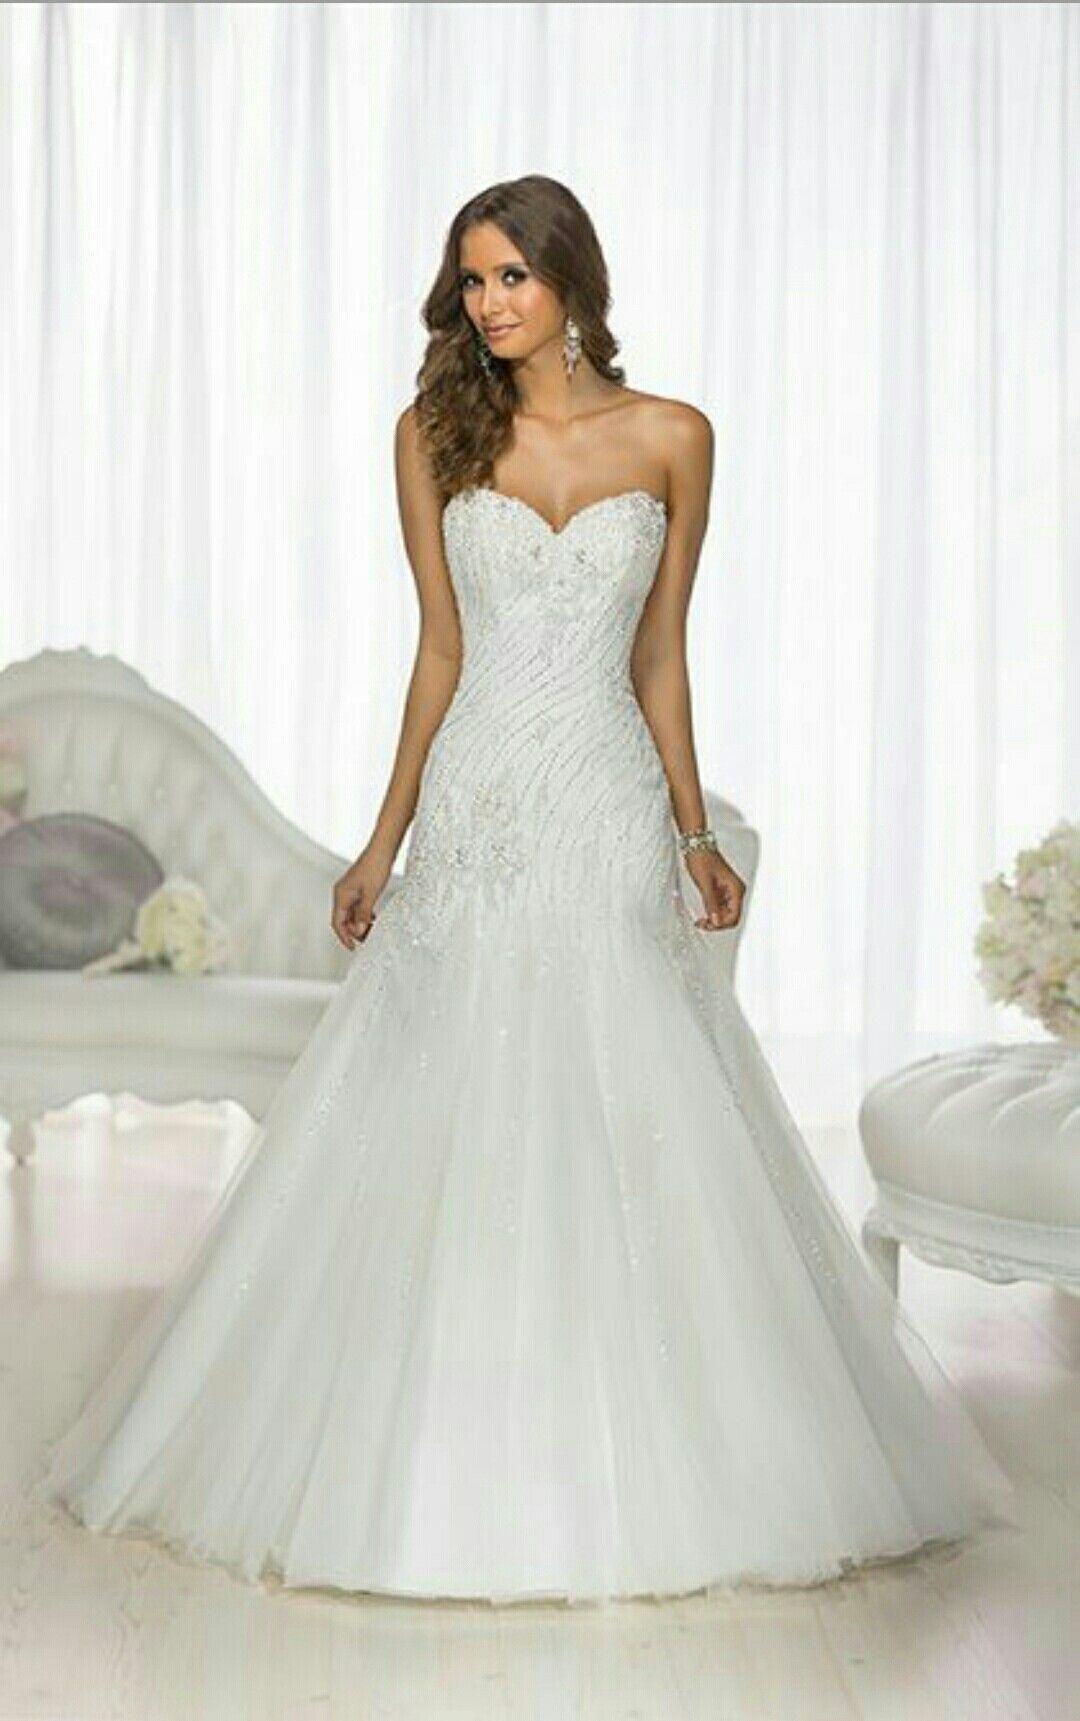 Essence of Australia | Vow Renewal | Pinterest | Bridal dresses ...